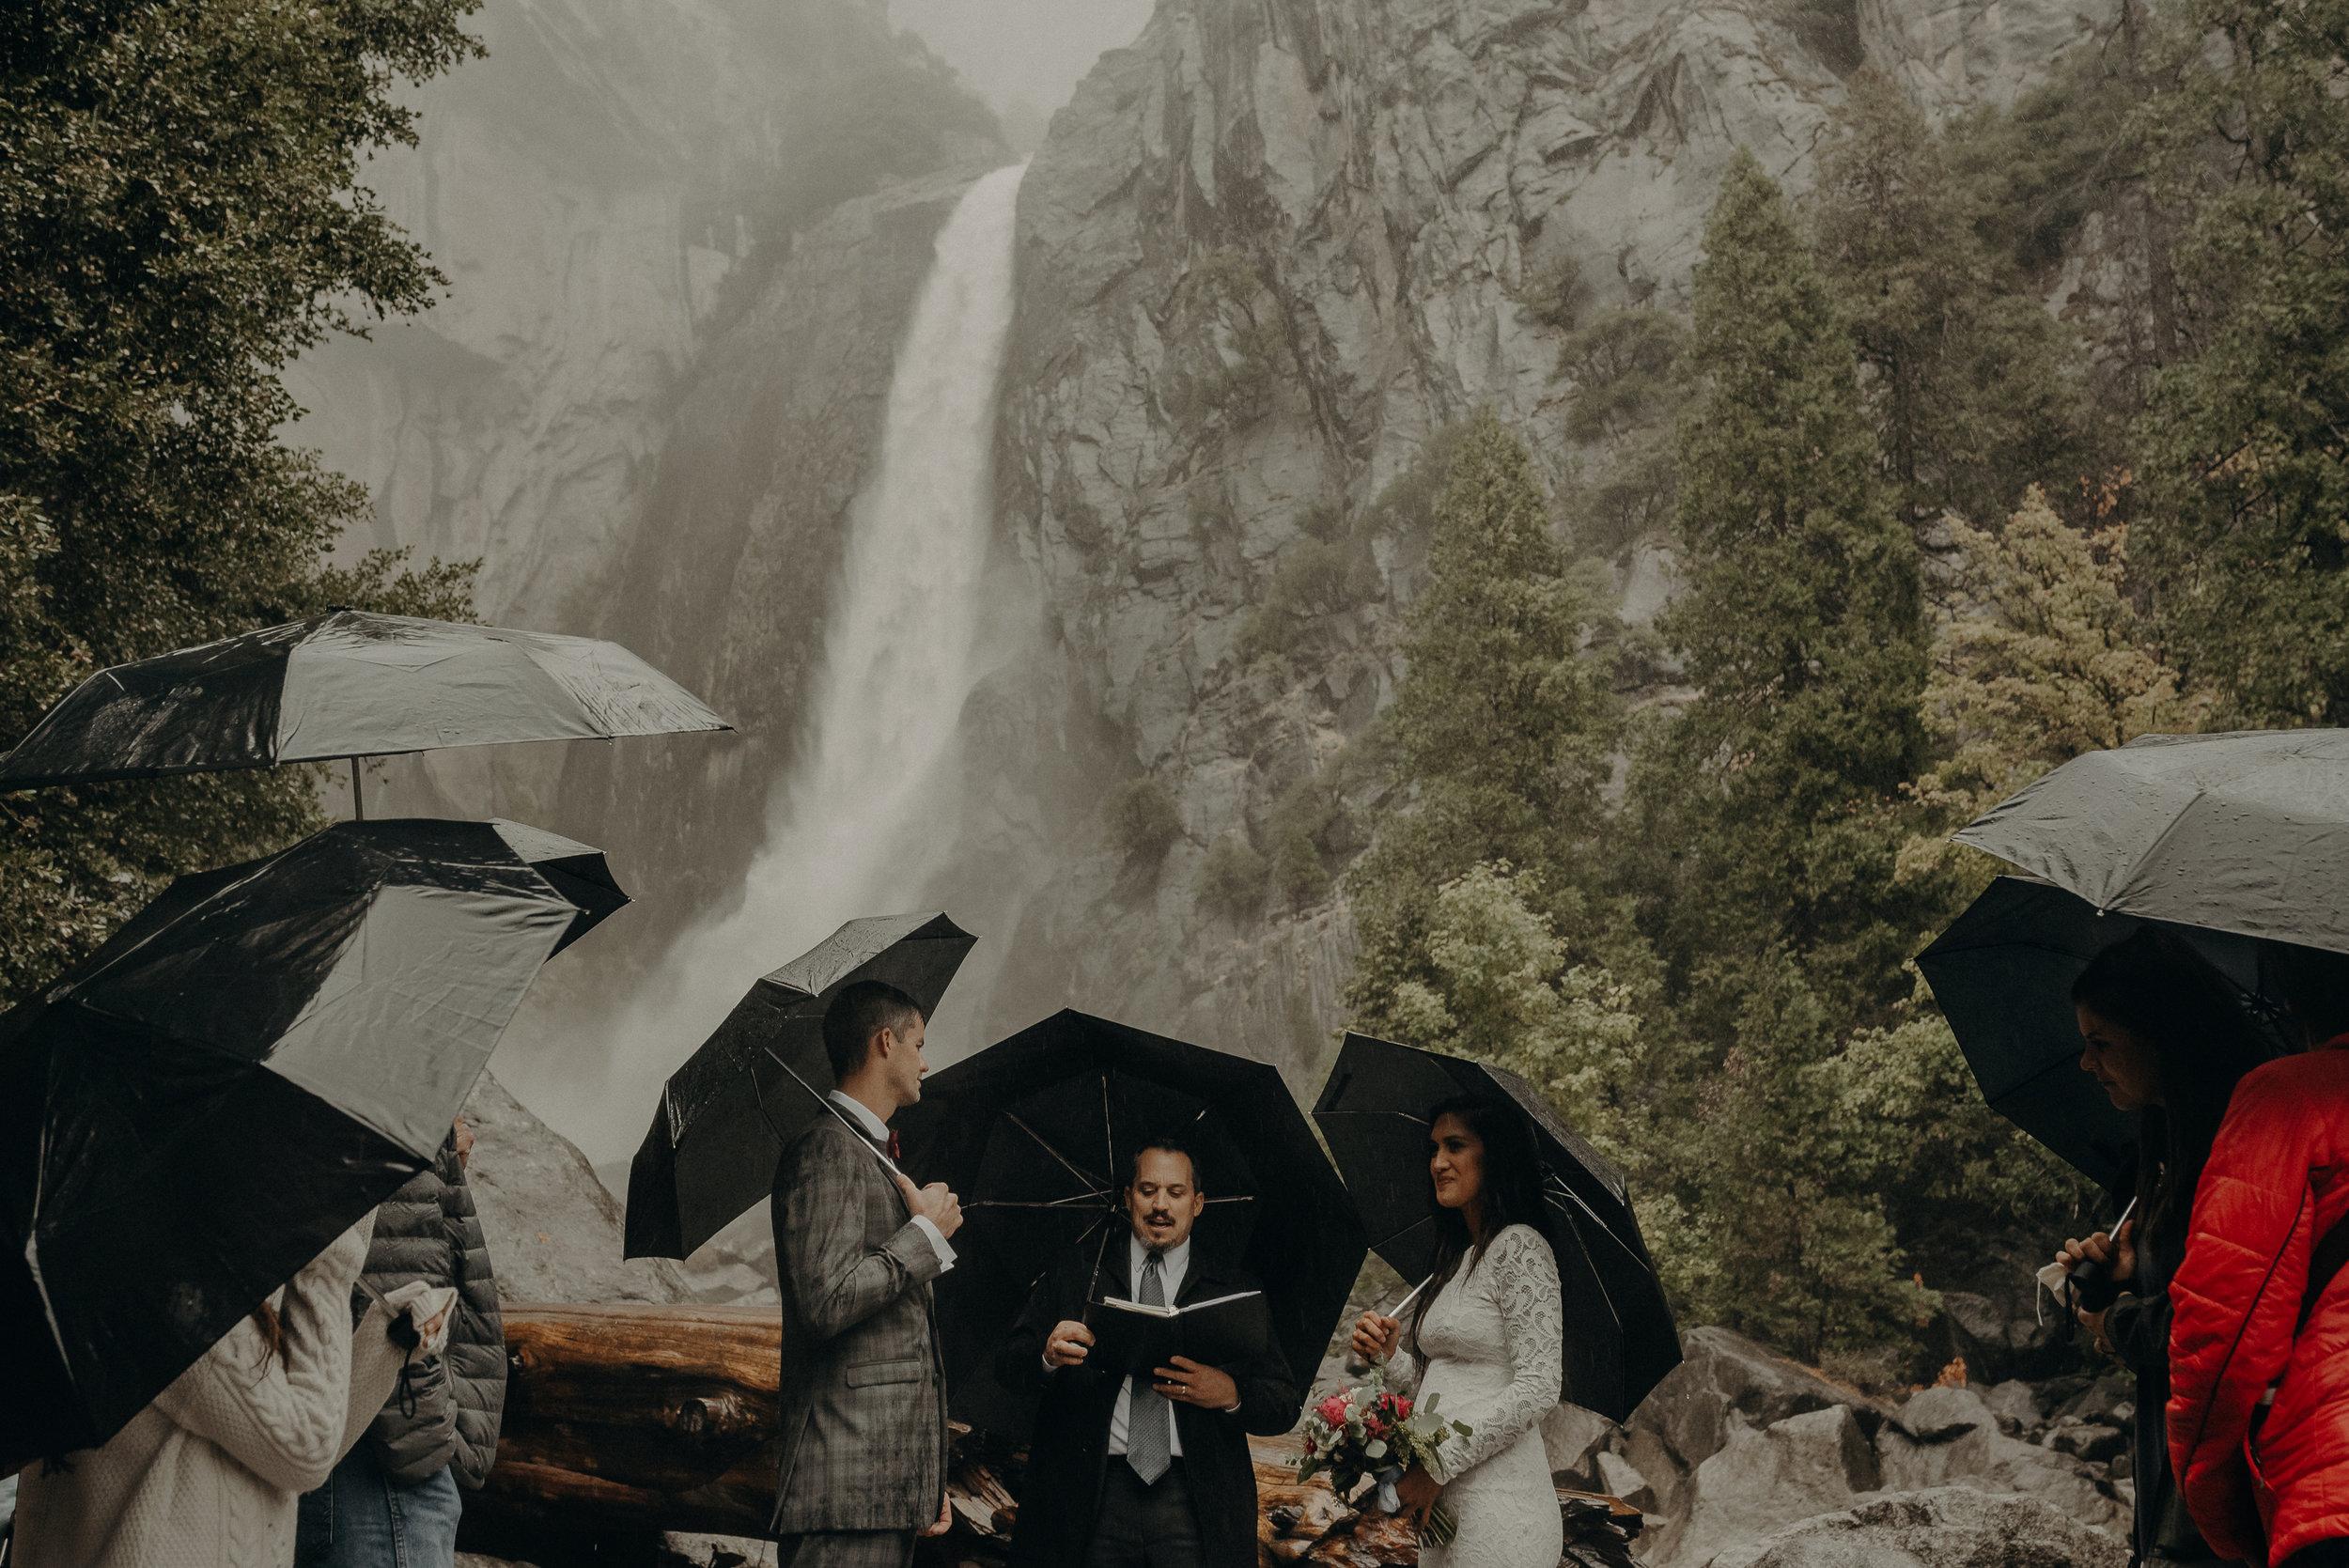 Isaiah + Taylor Photography - Yosemite Elopement - Los Angeles Wedding Photographer-28.jpg